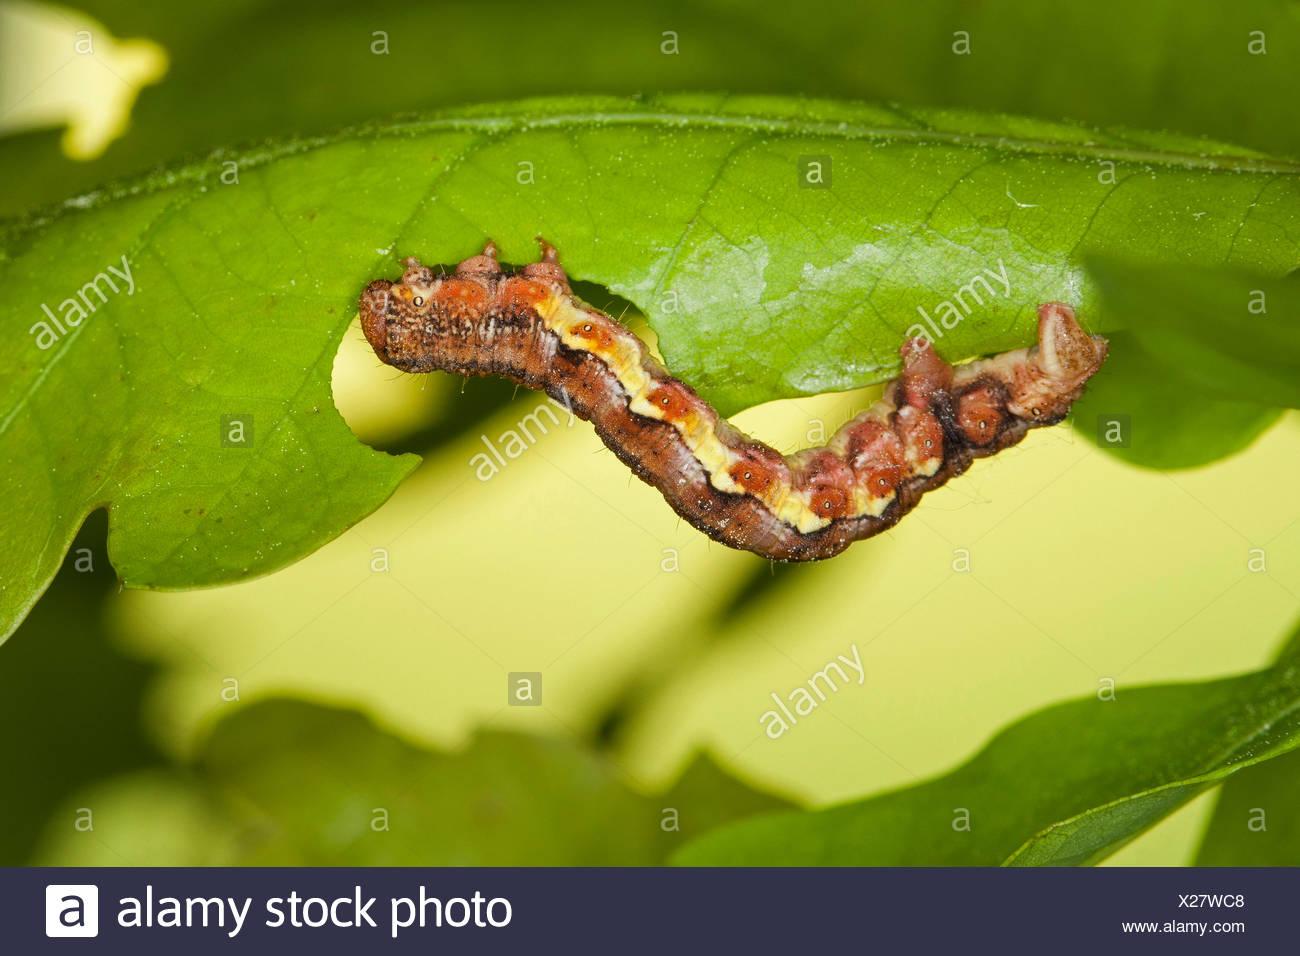 Mottled umber (Erannis defoliaria, Phalaena defoliaria, Hybernia defoliaria), caterpillar feeeding on oak leaf, forest pest, Germany - Stock Image